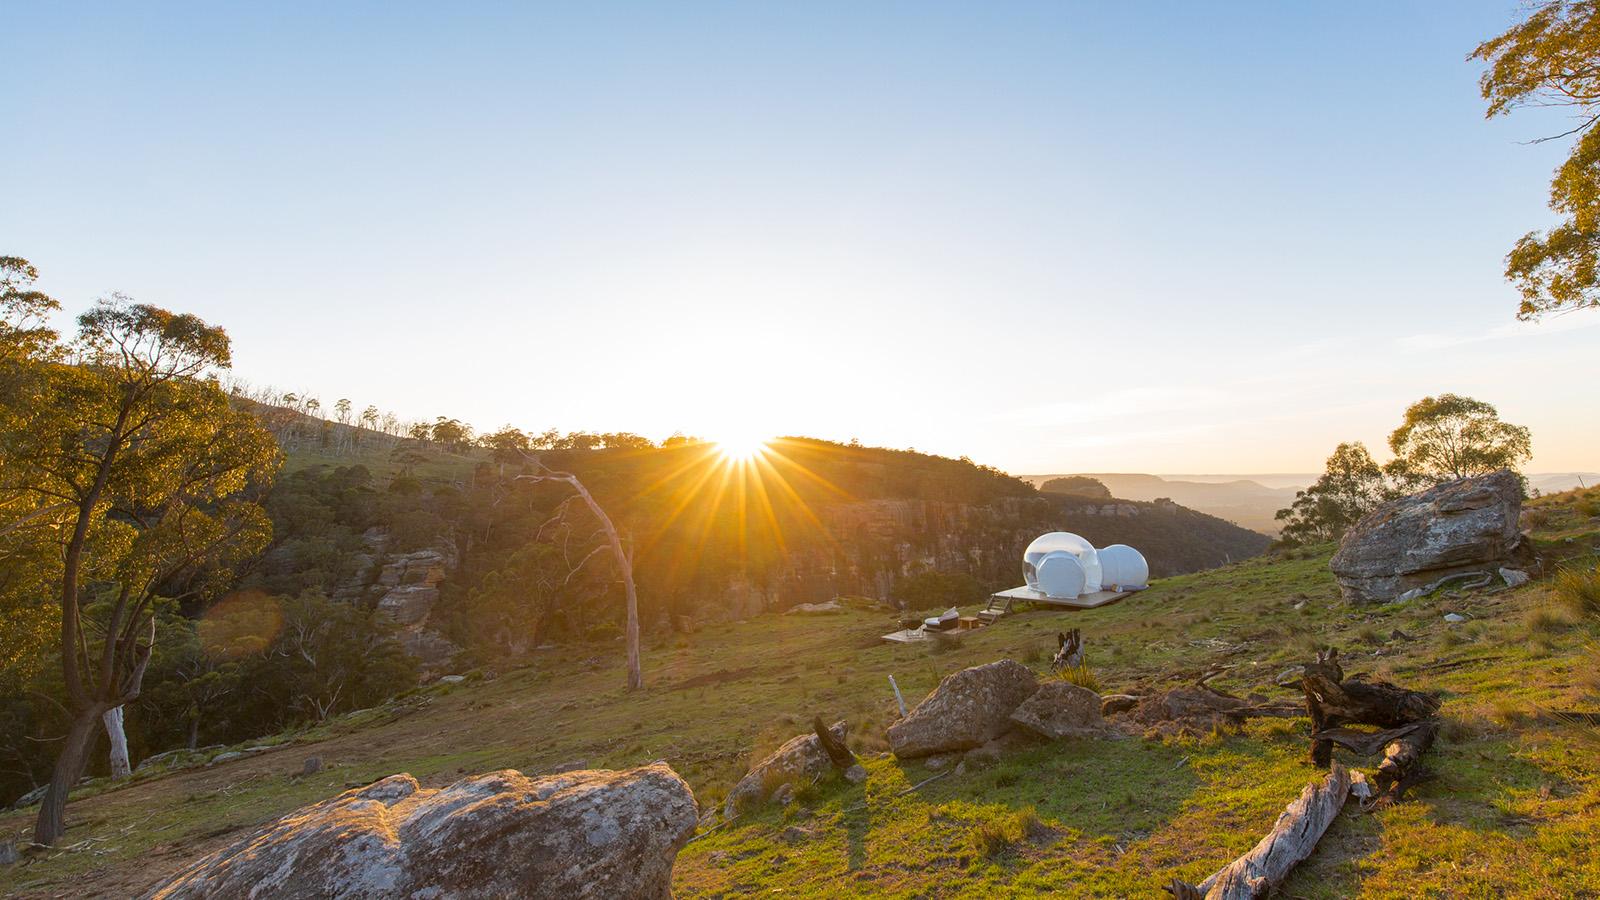 Bubbletent Australia, the ultimate skygazing experience